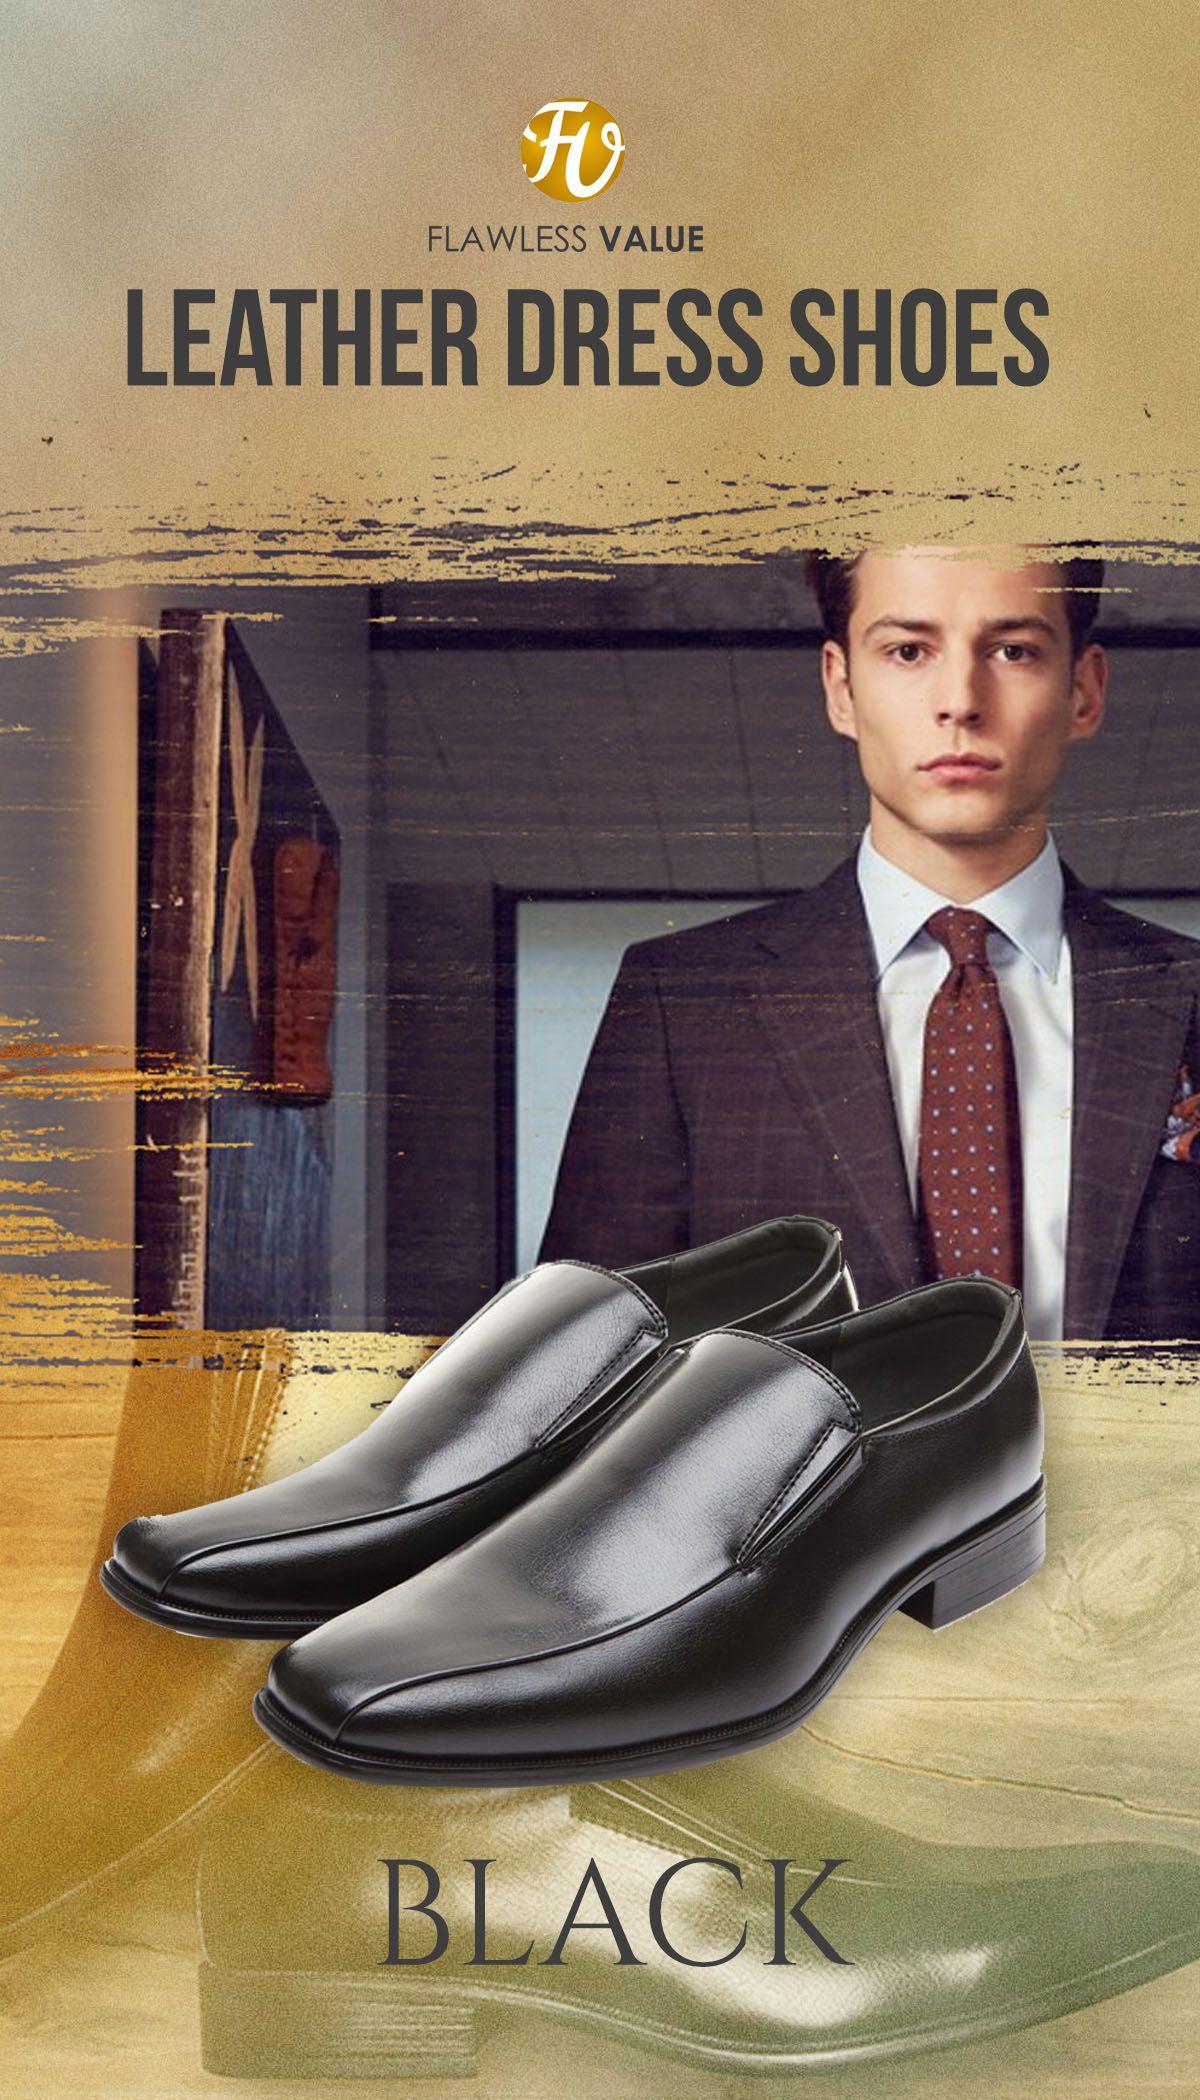 Xper Designer Fashion Slip On Dress Shoes Black Limited Edition Men S Top Designer Fashion Brand Stre Slip On Dress Shoes Dress Shoes Men Leather Dress Shoes [ 2100 x 1200 Pixel ]